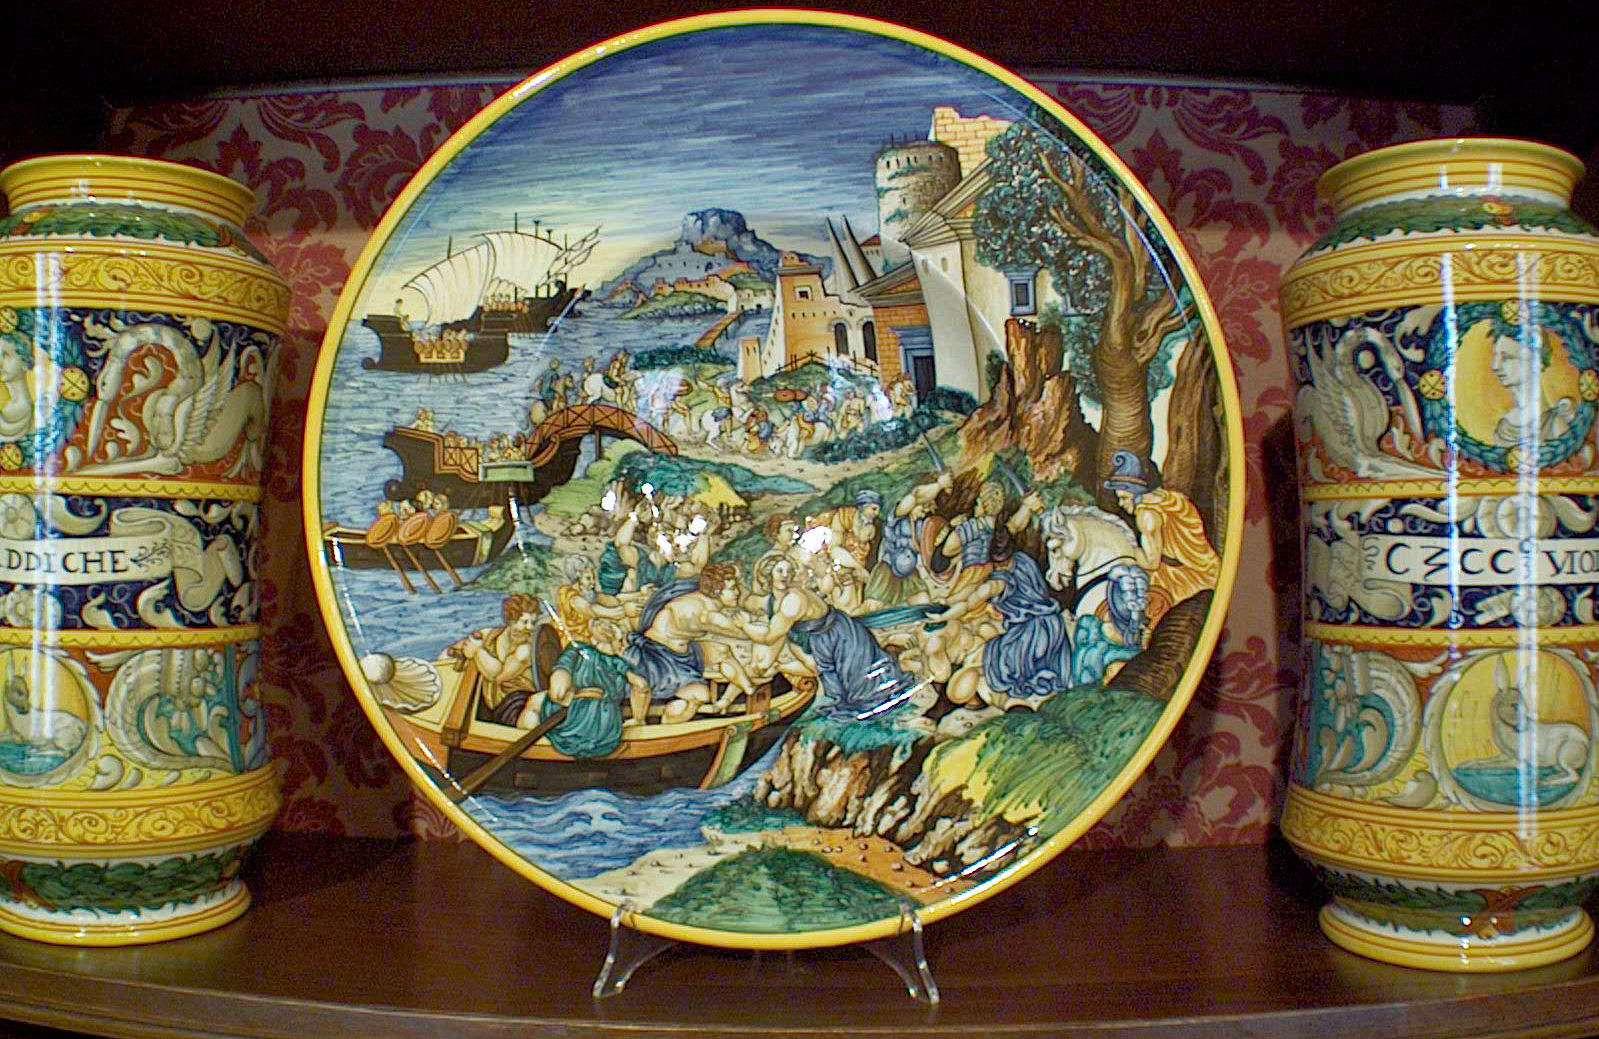 Keramikk fra Urbania